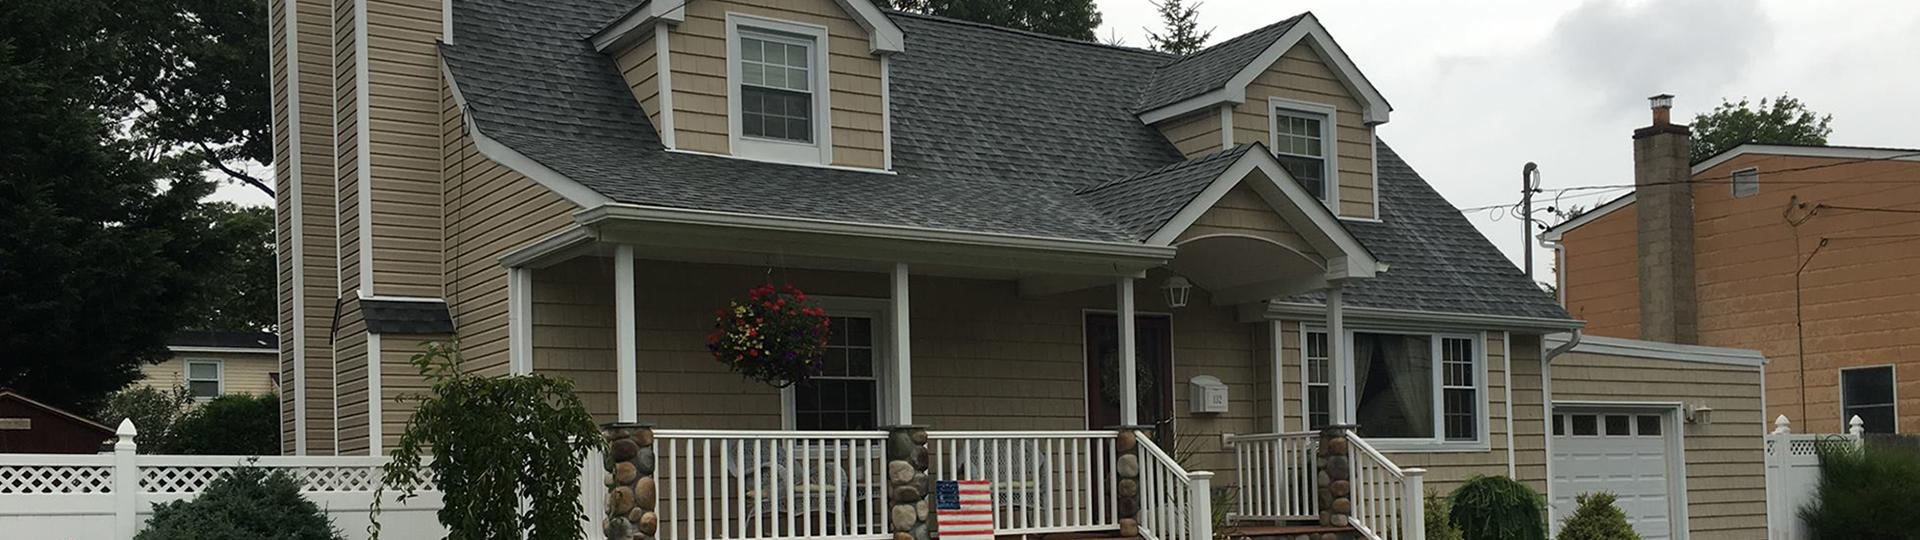 Roofing Siding Carpentry Masonry Long Island